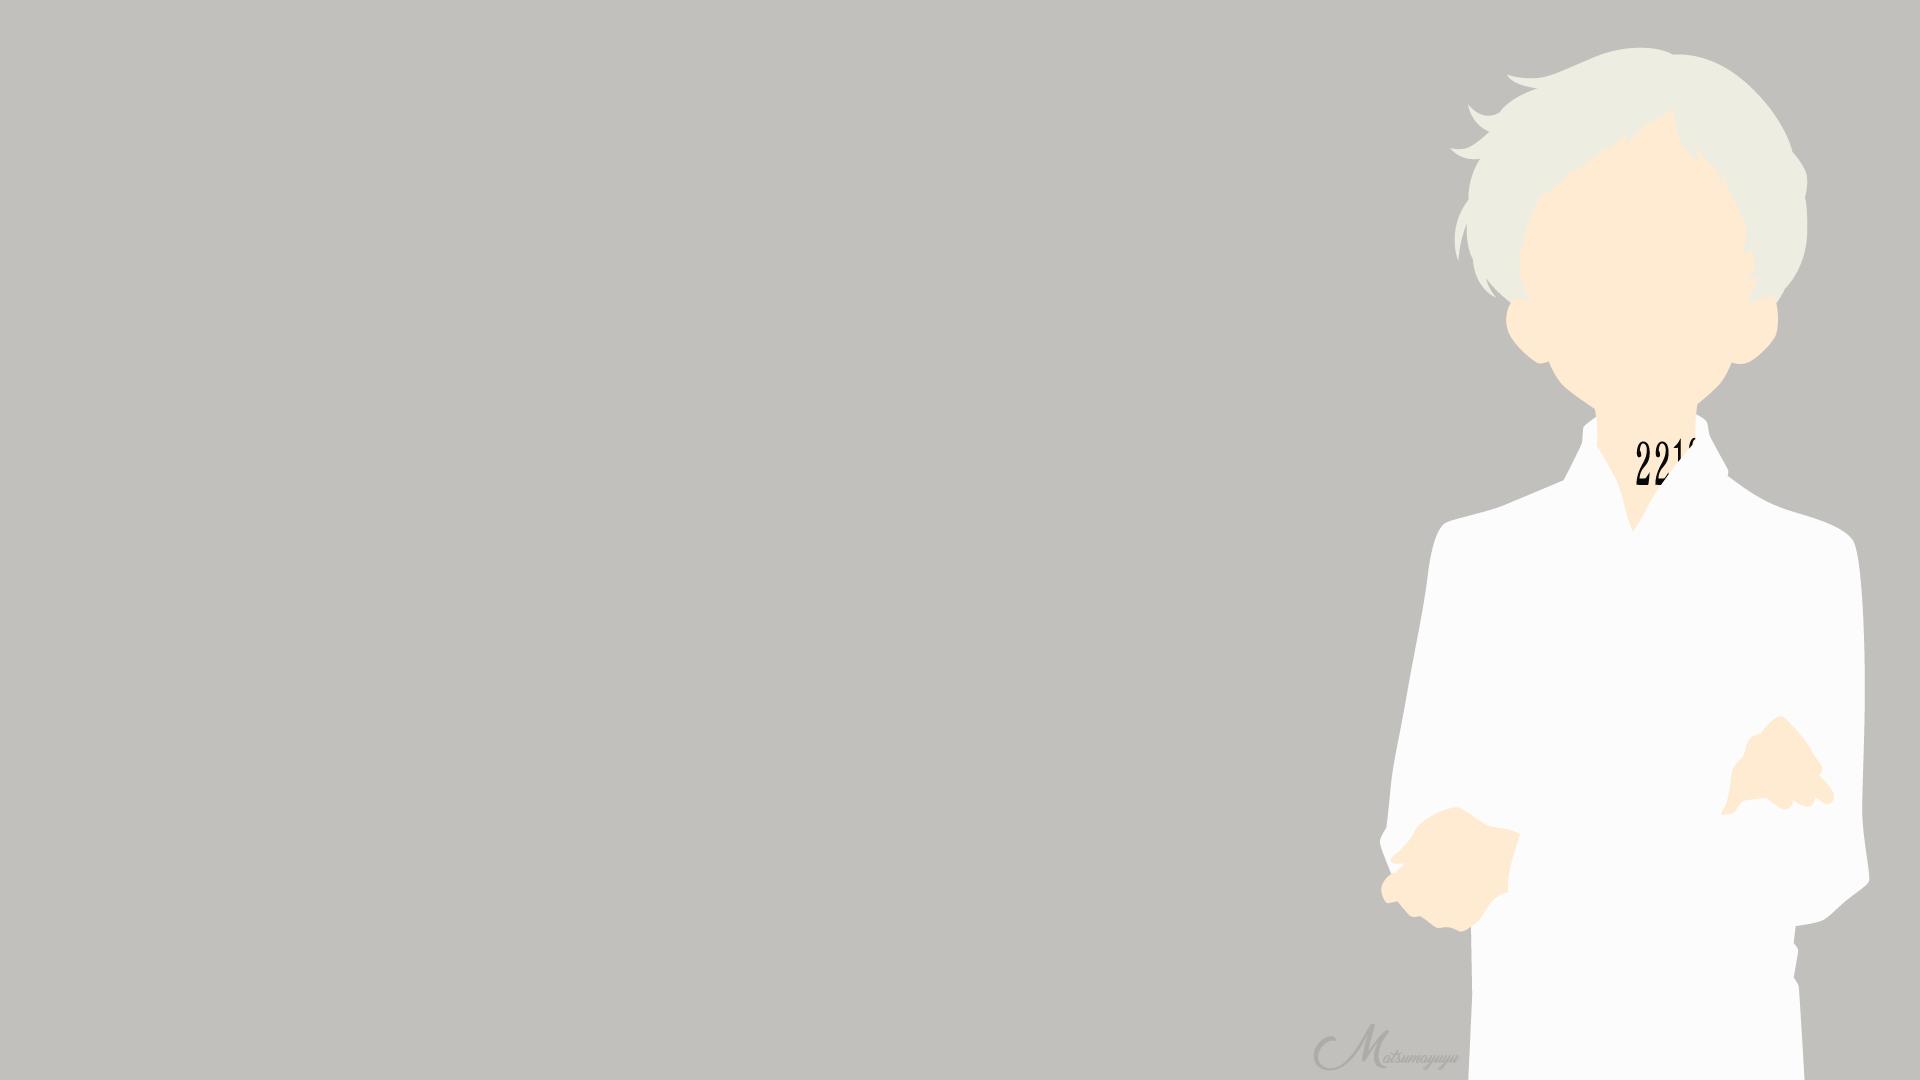 Norman From Yakusoku No Neverland Hd Wallpaper Background Image